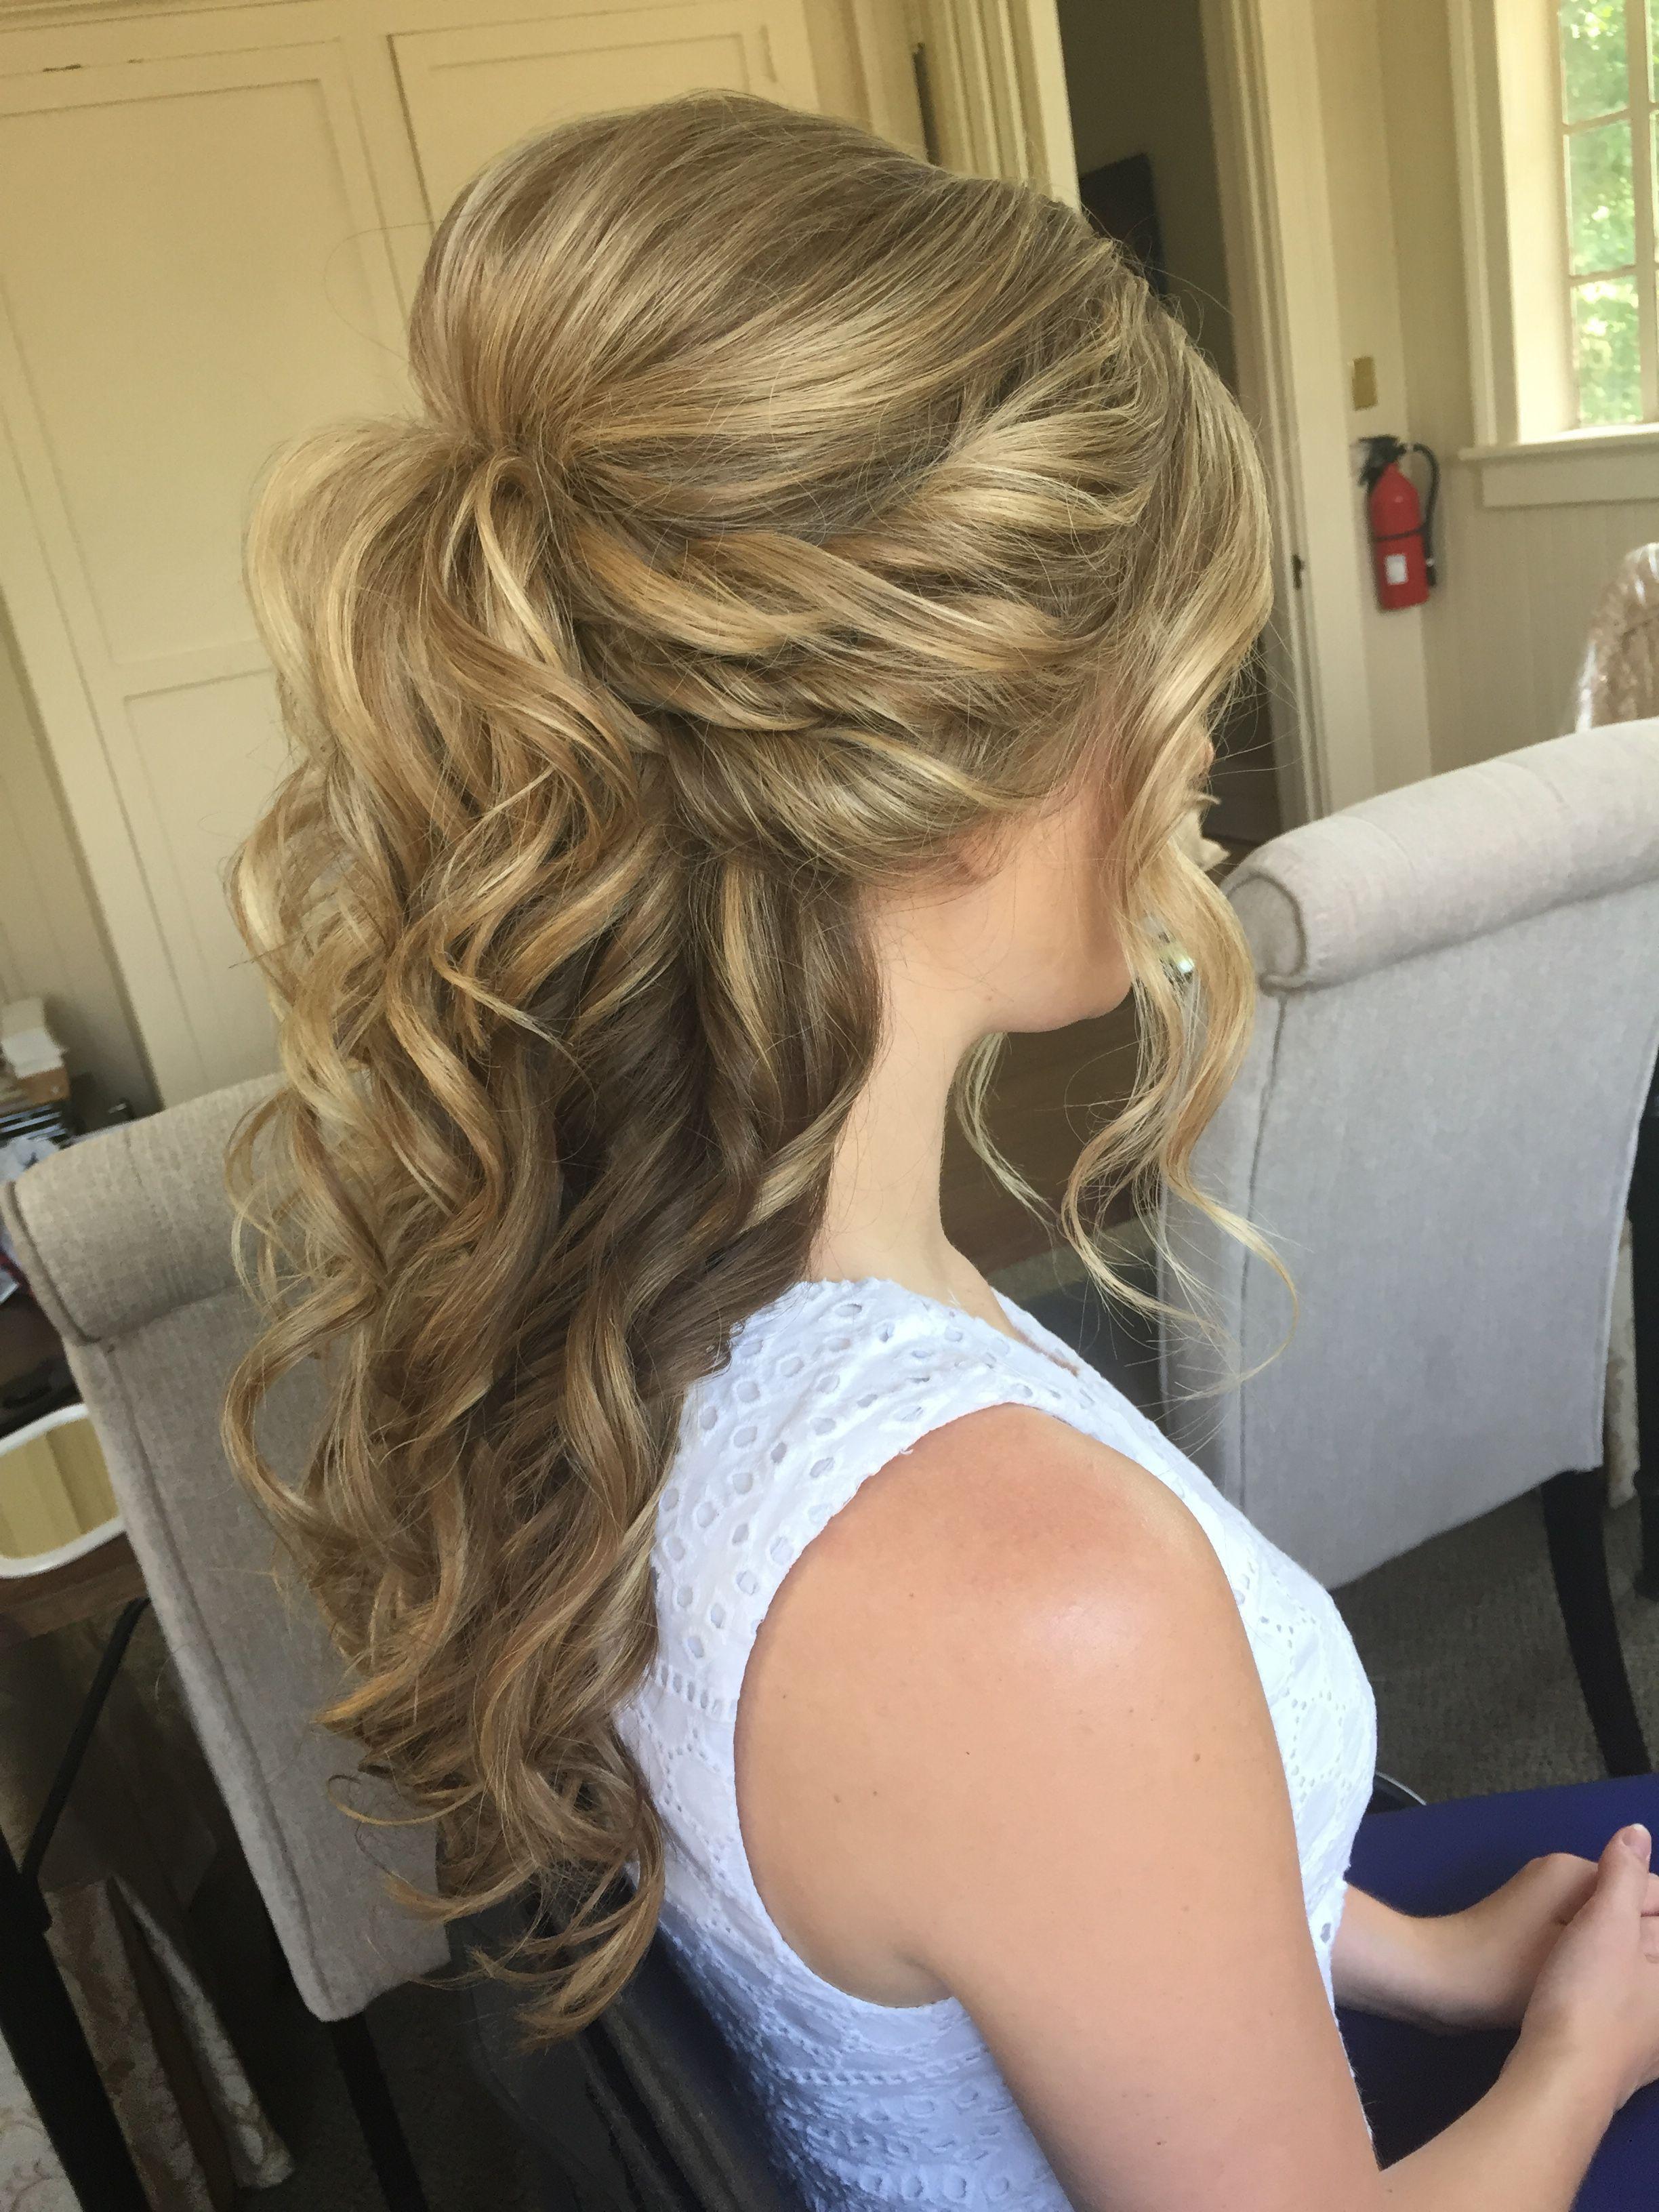 68 Semi Formal Hairstyles To Do At Home Blogvertorg Half Updo Hairstyles Wedding Hair Half Hair Styles